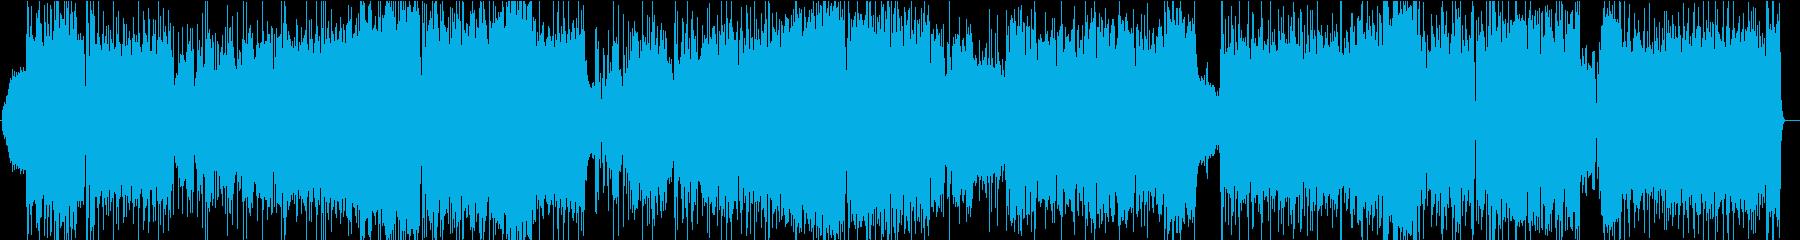 OP向け⁉︎ツインボーカル高速デジロックの再生済みの波形